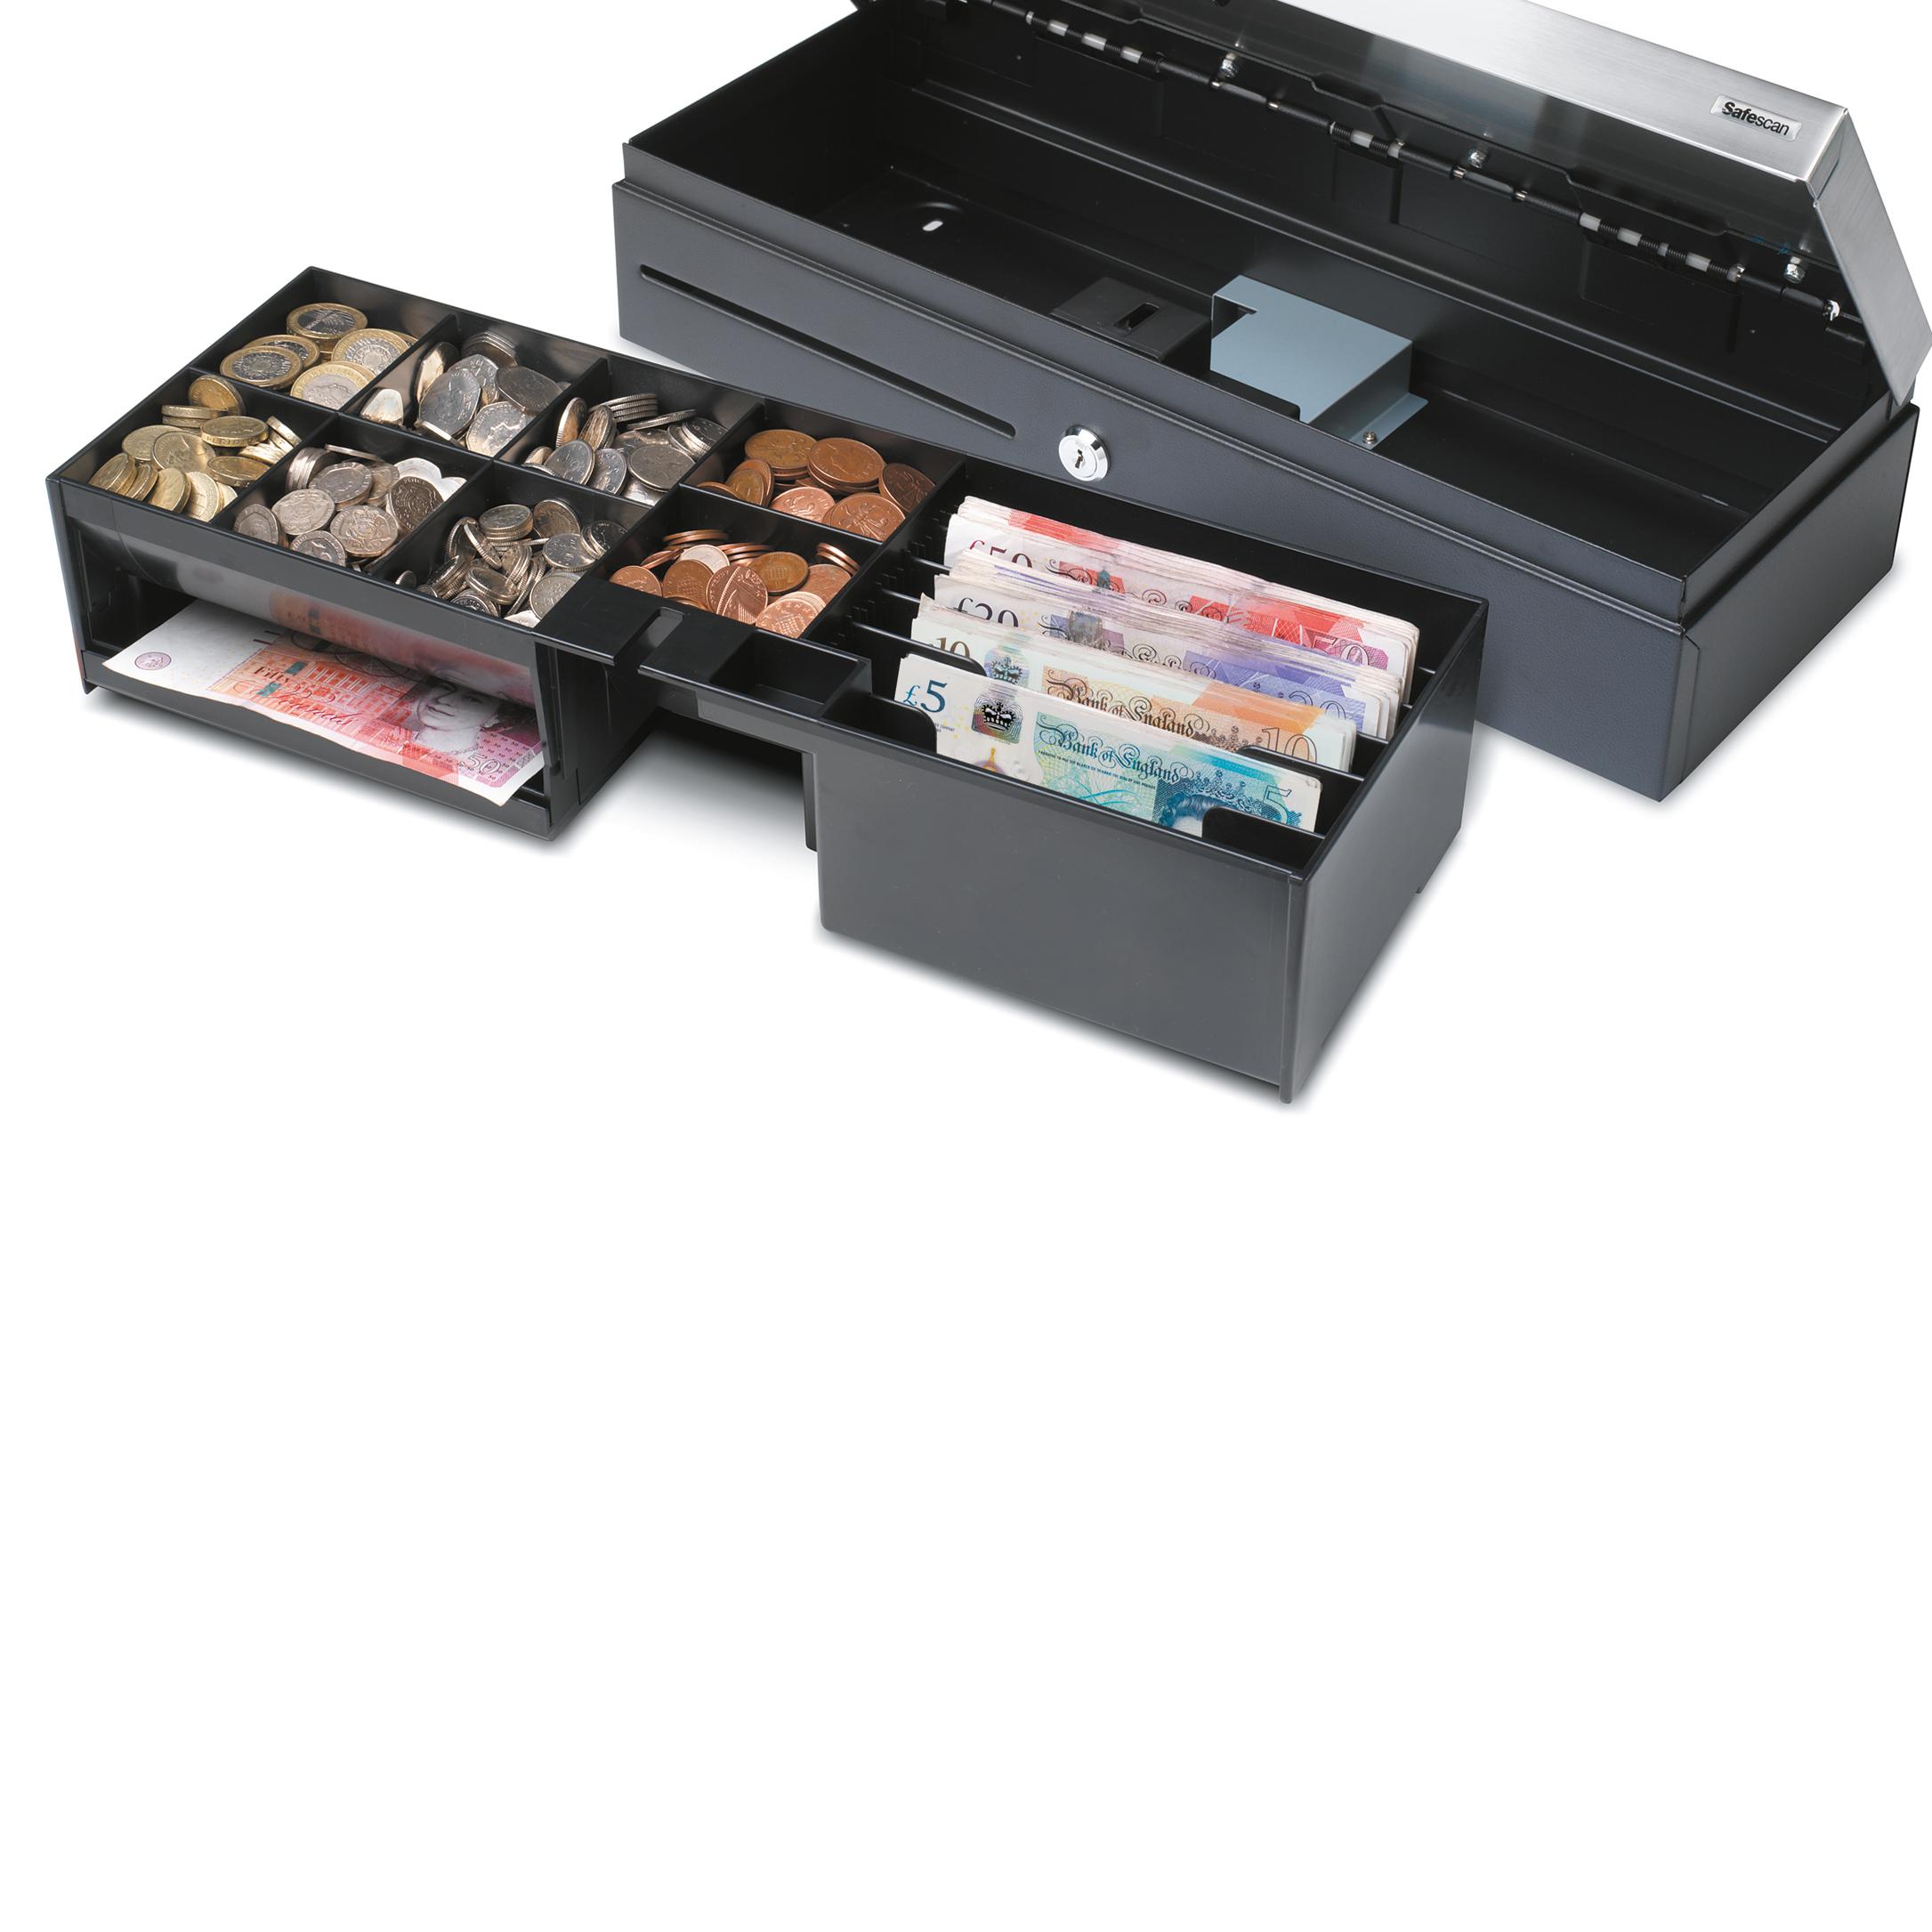 Safescan SD-4617S Cash Drawer Flip Top Standard Use 4.3kg L460xW170xH100m Black/Silver Ref 132-0498